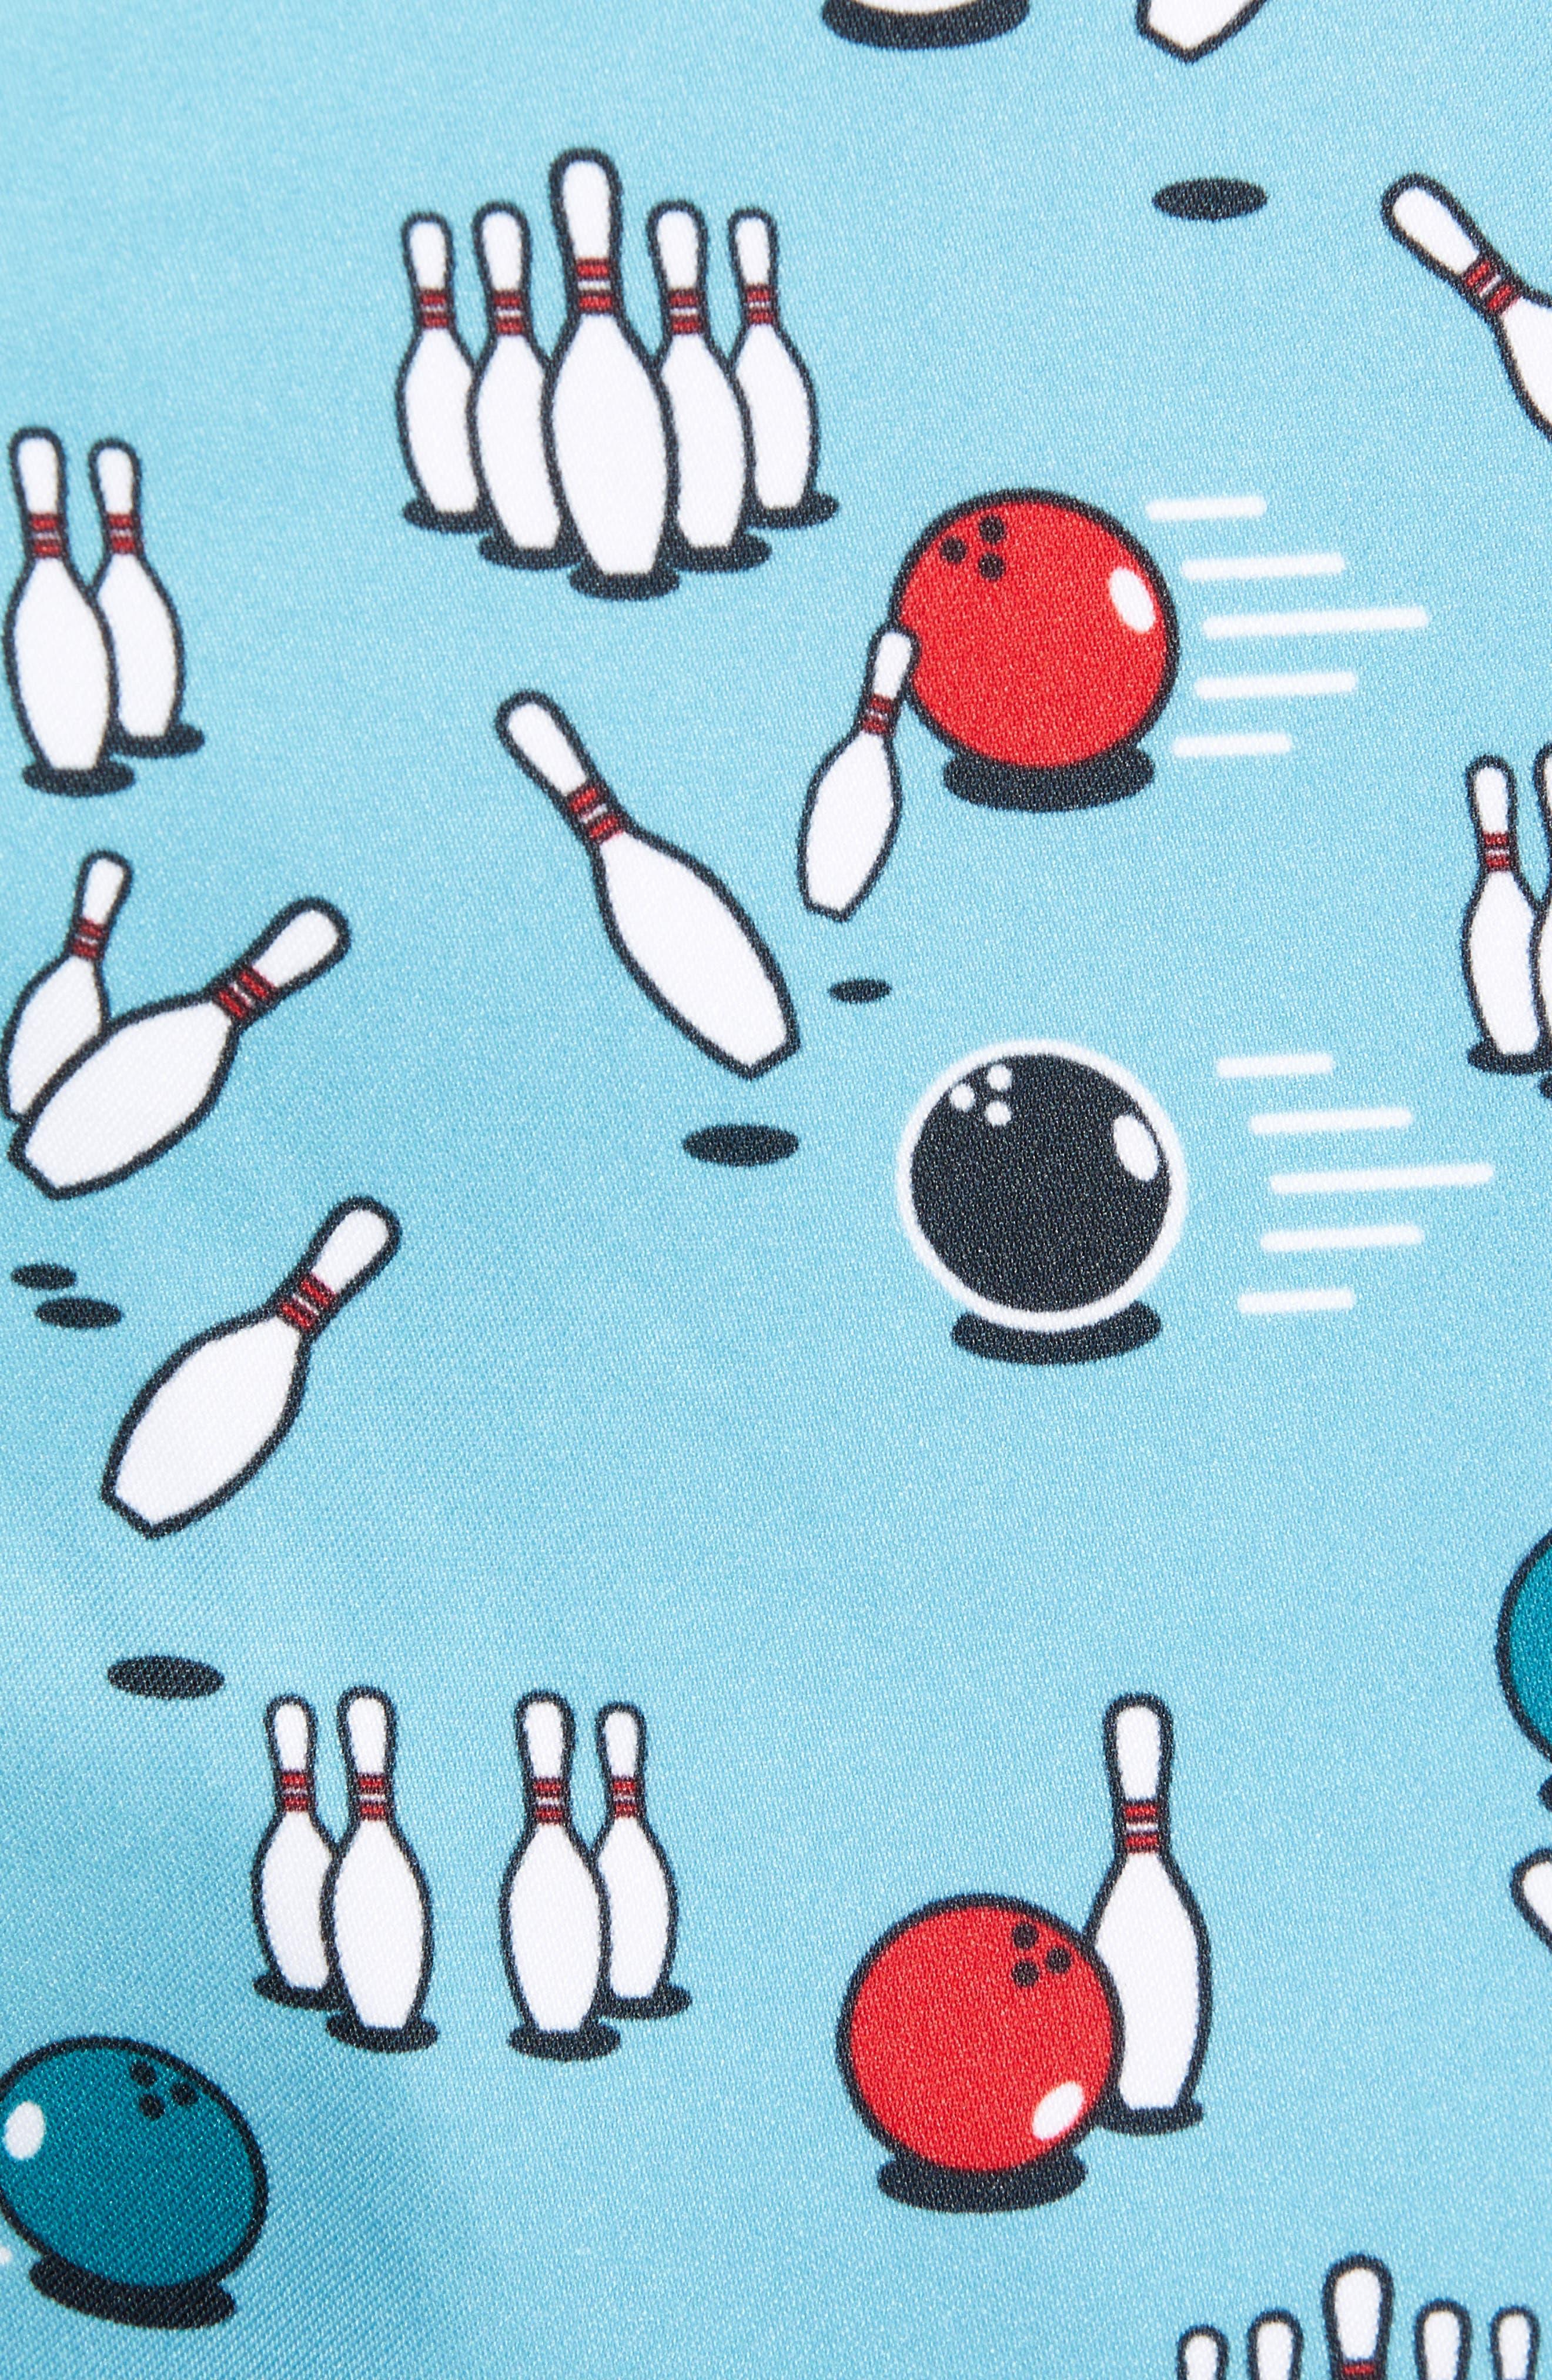 Bowling Print Swim Trunks,                             Alternate thumbnail 4, color,                             Delphinium Blue